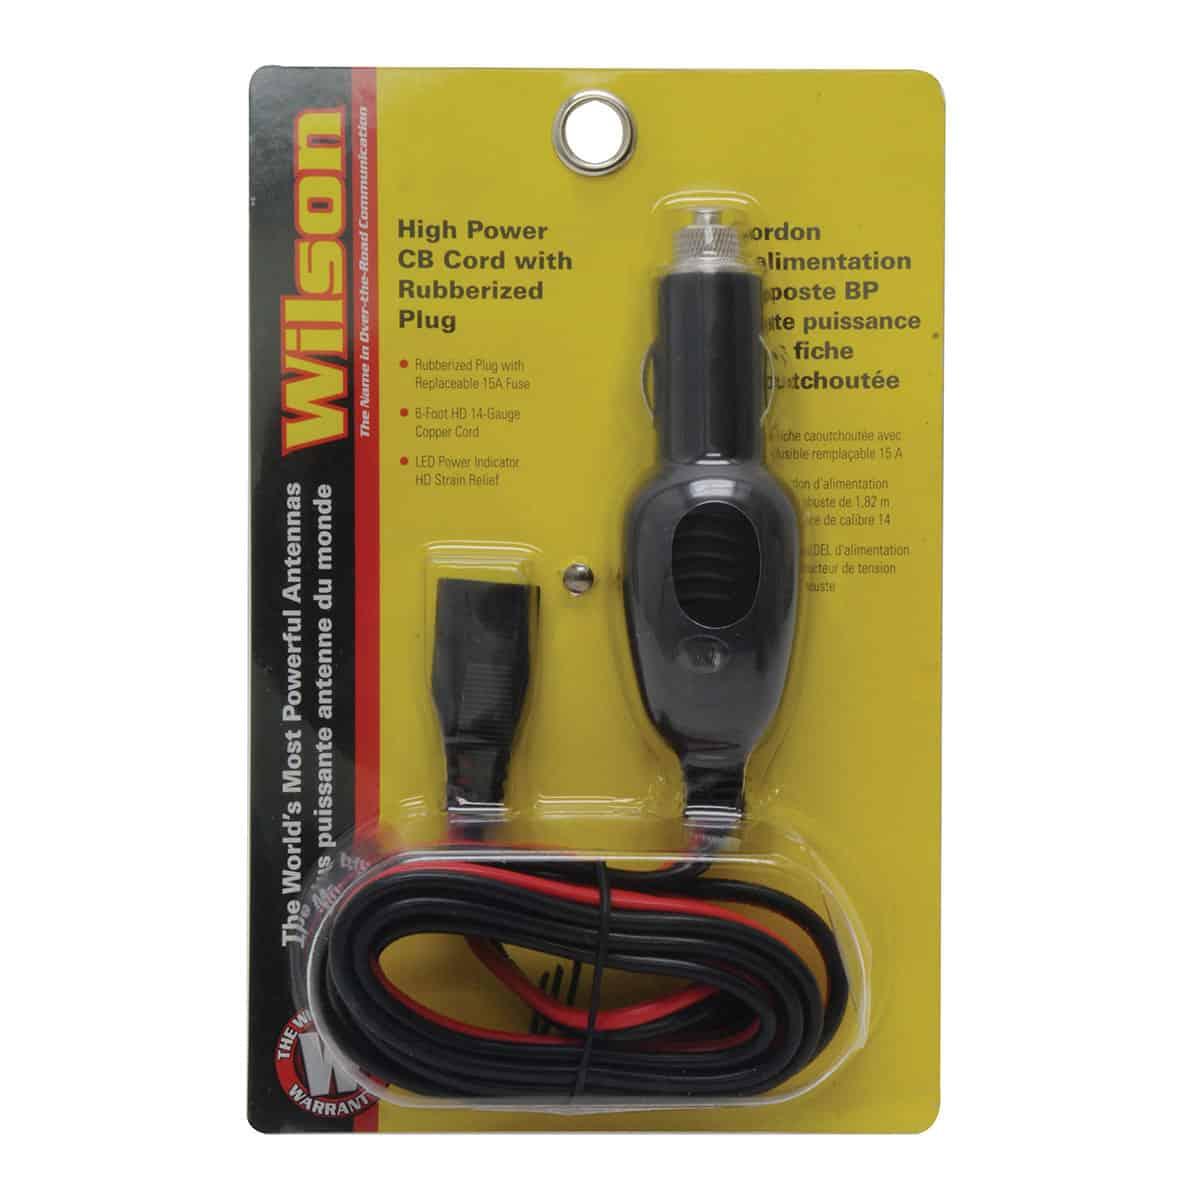 3053CBPP - Wilson High Power CB Cord